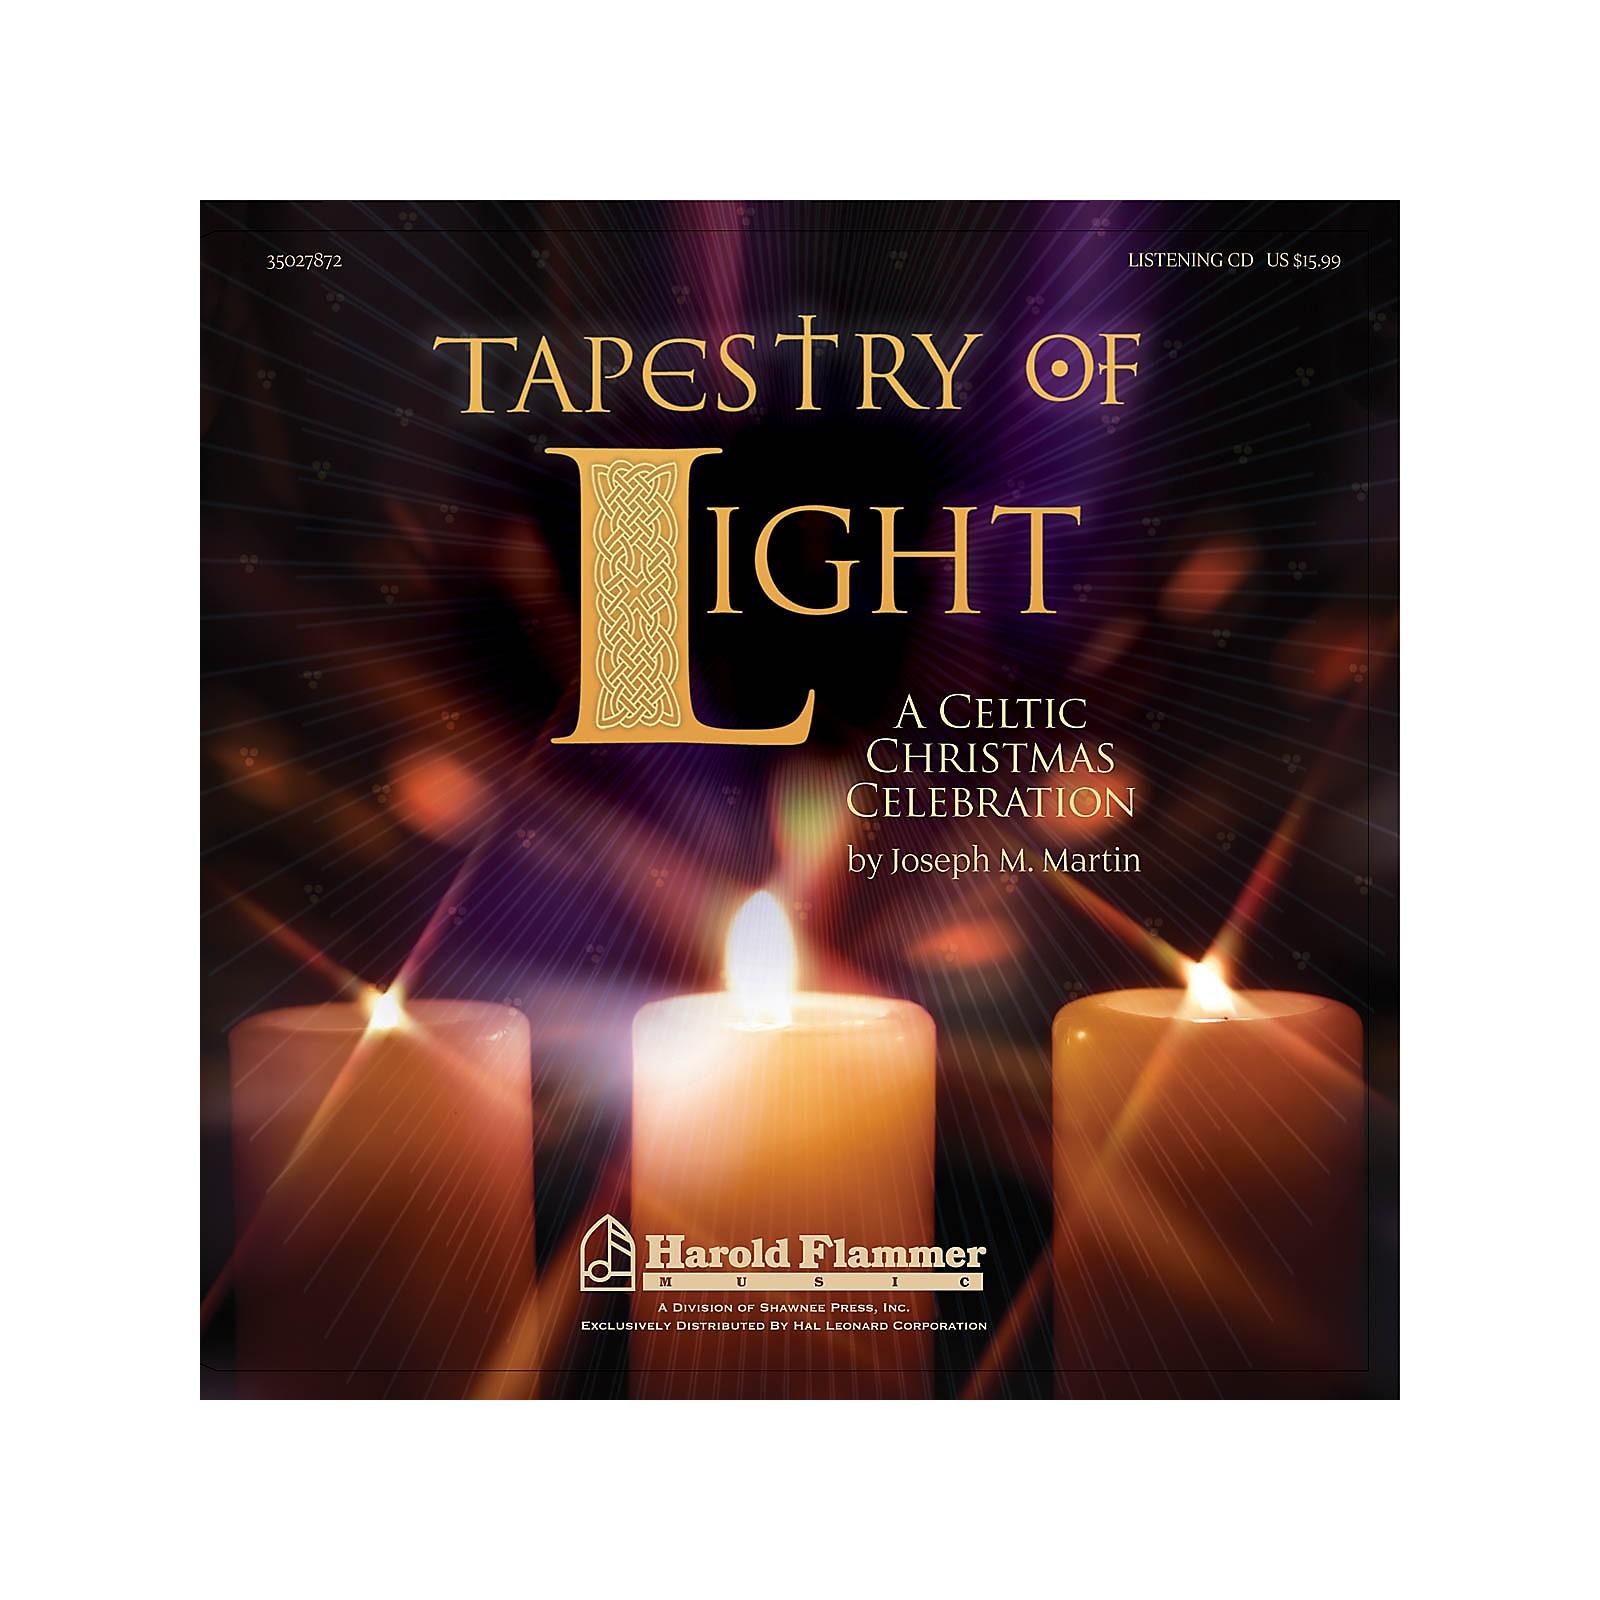 Shawnee Press Tapestry of Light (A Celtic Christmas Celebration) Listening CD composed by Joseph M. Martin